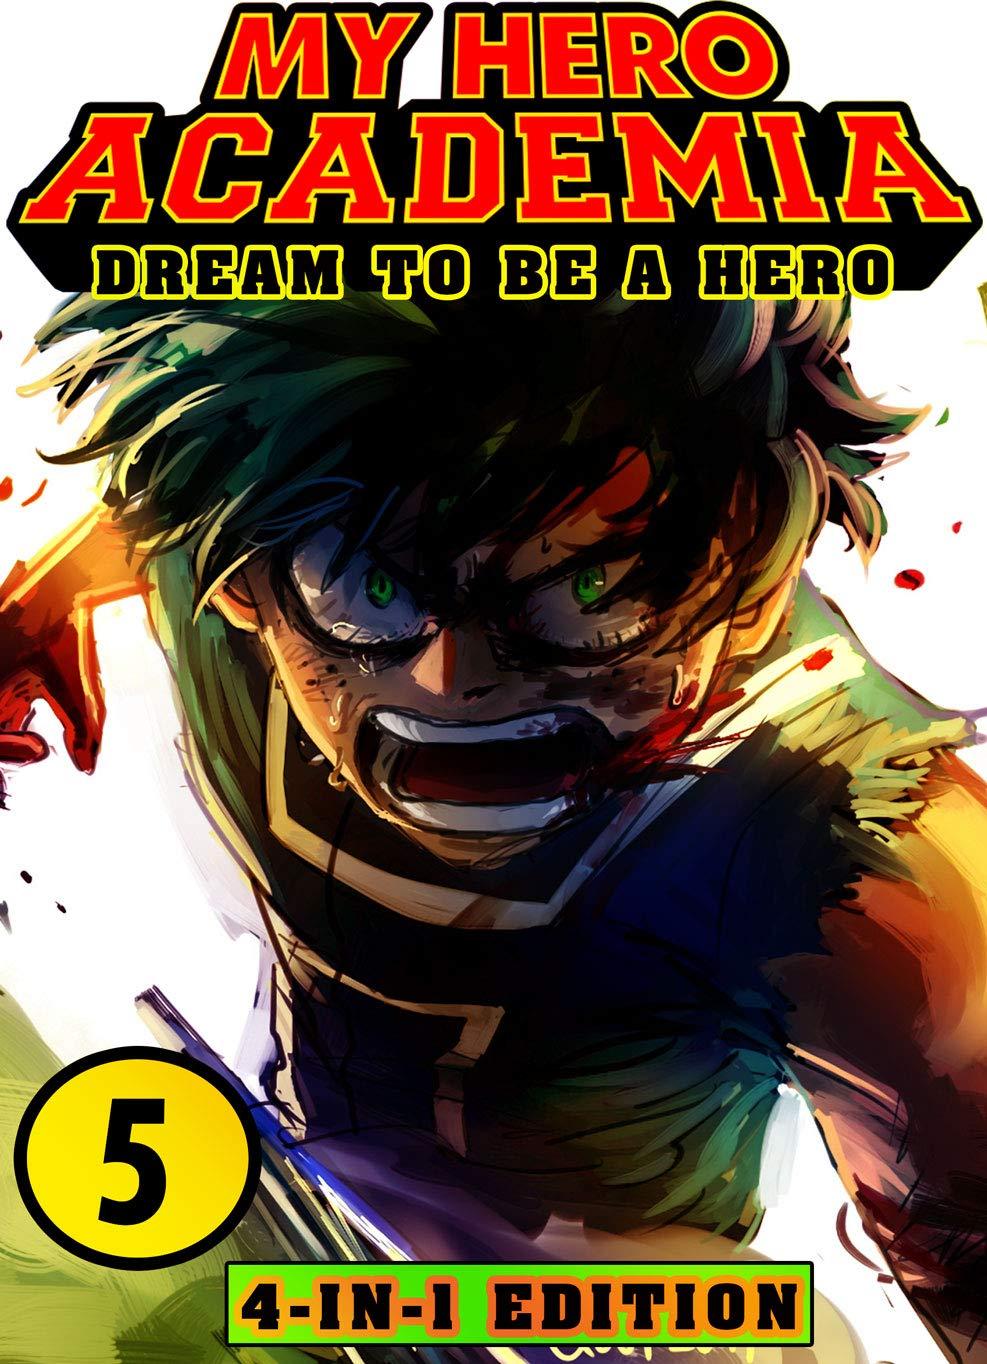 Dream To Be Hero: Book 5 Collection - New Edition - Manga Fantasy Adventures My Hero Academia Action Shonen